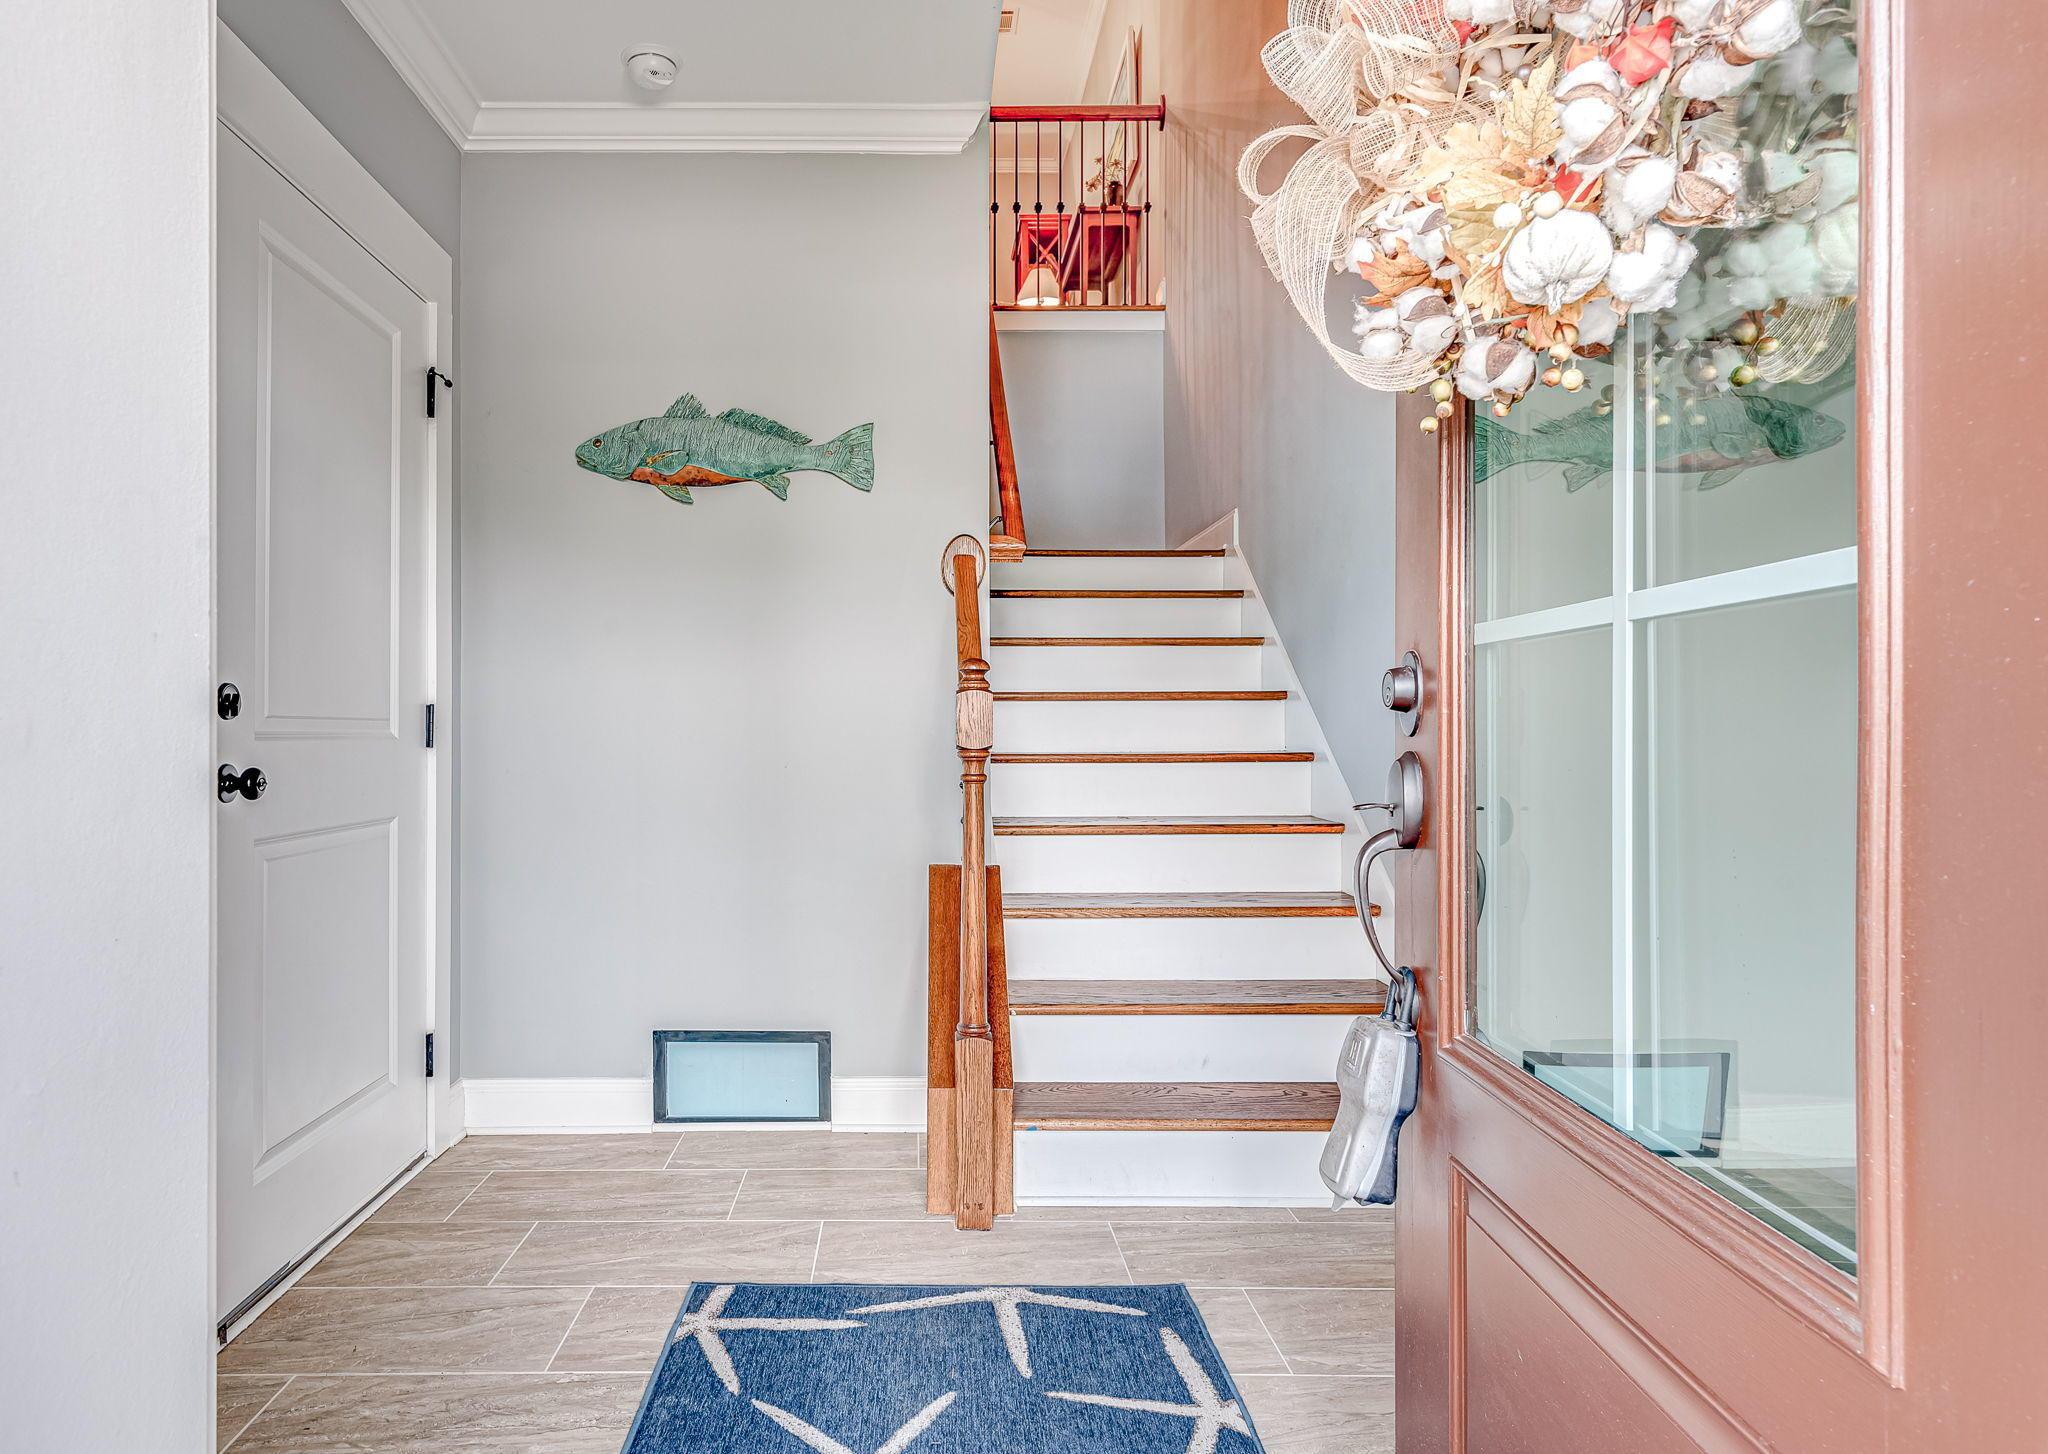 Etiwan Pointe Homes For Sale - 159 Slipper Shell, Mount Pleasant, SC - 38